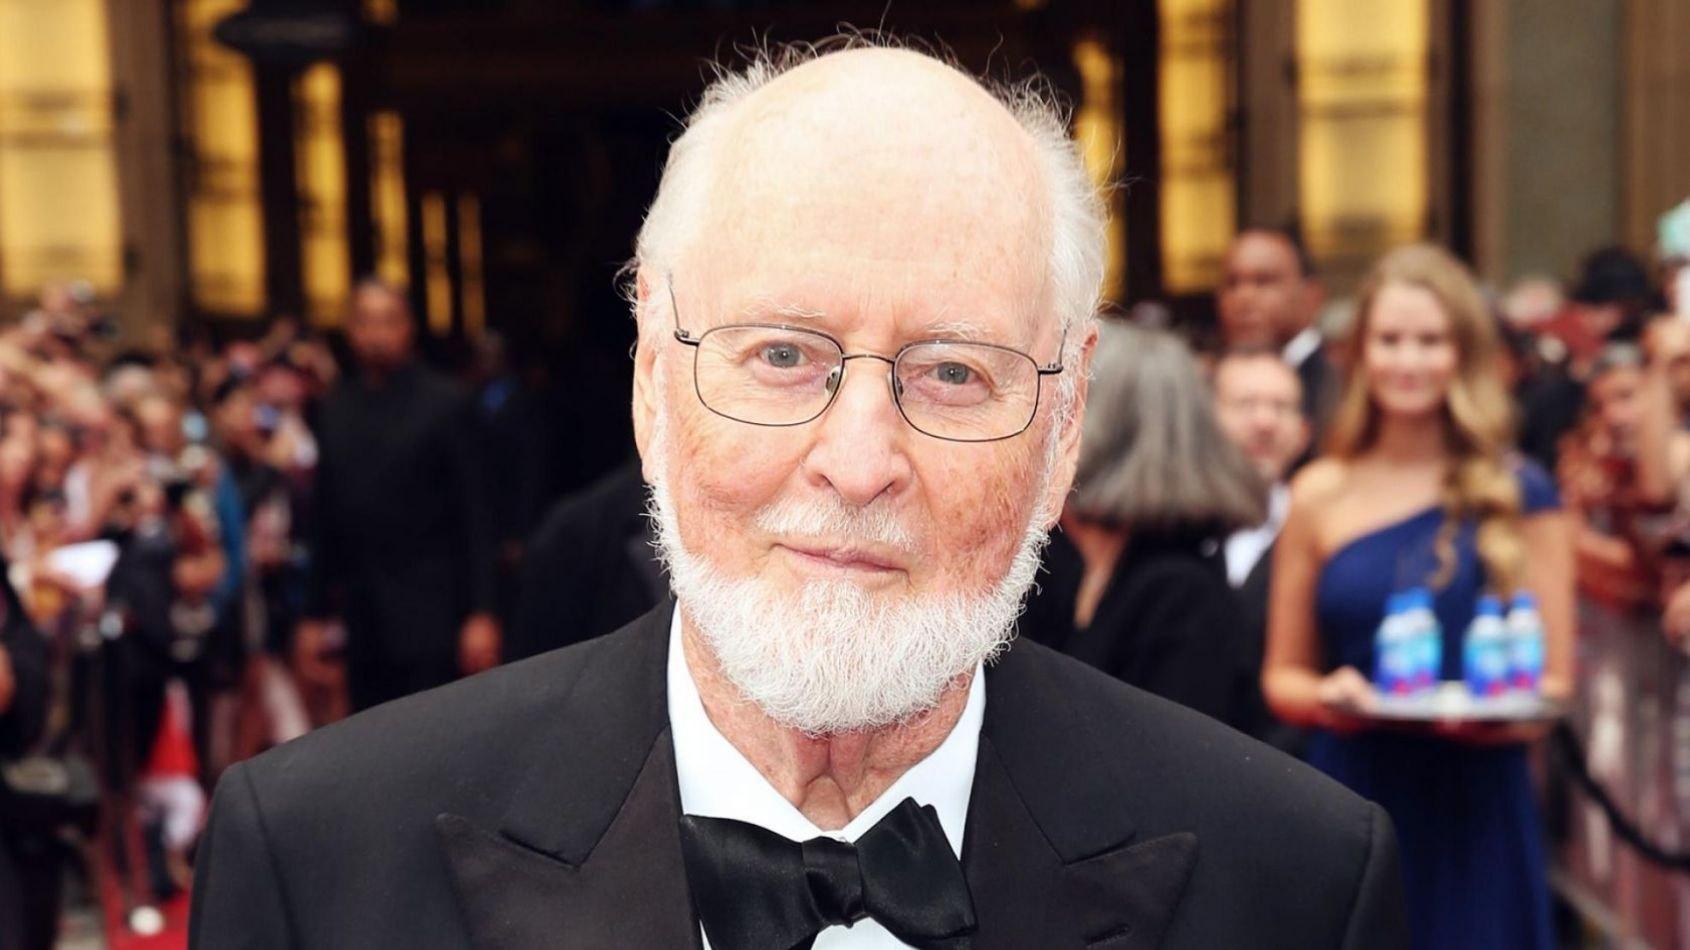 John Williams arretera de composer pour Star Wars après l'épisode IX